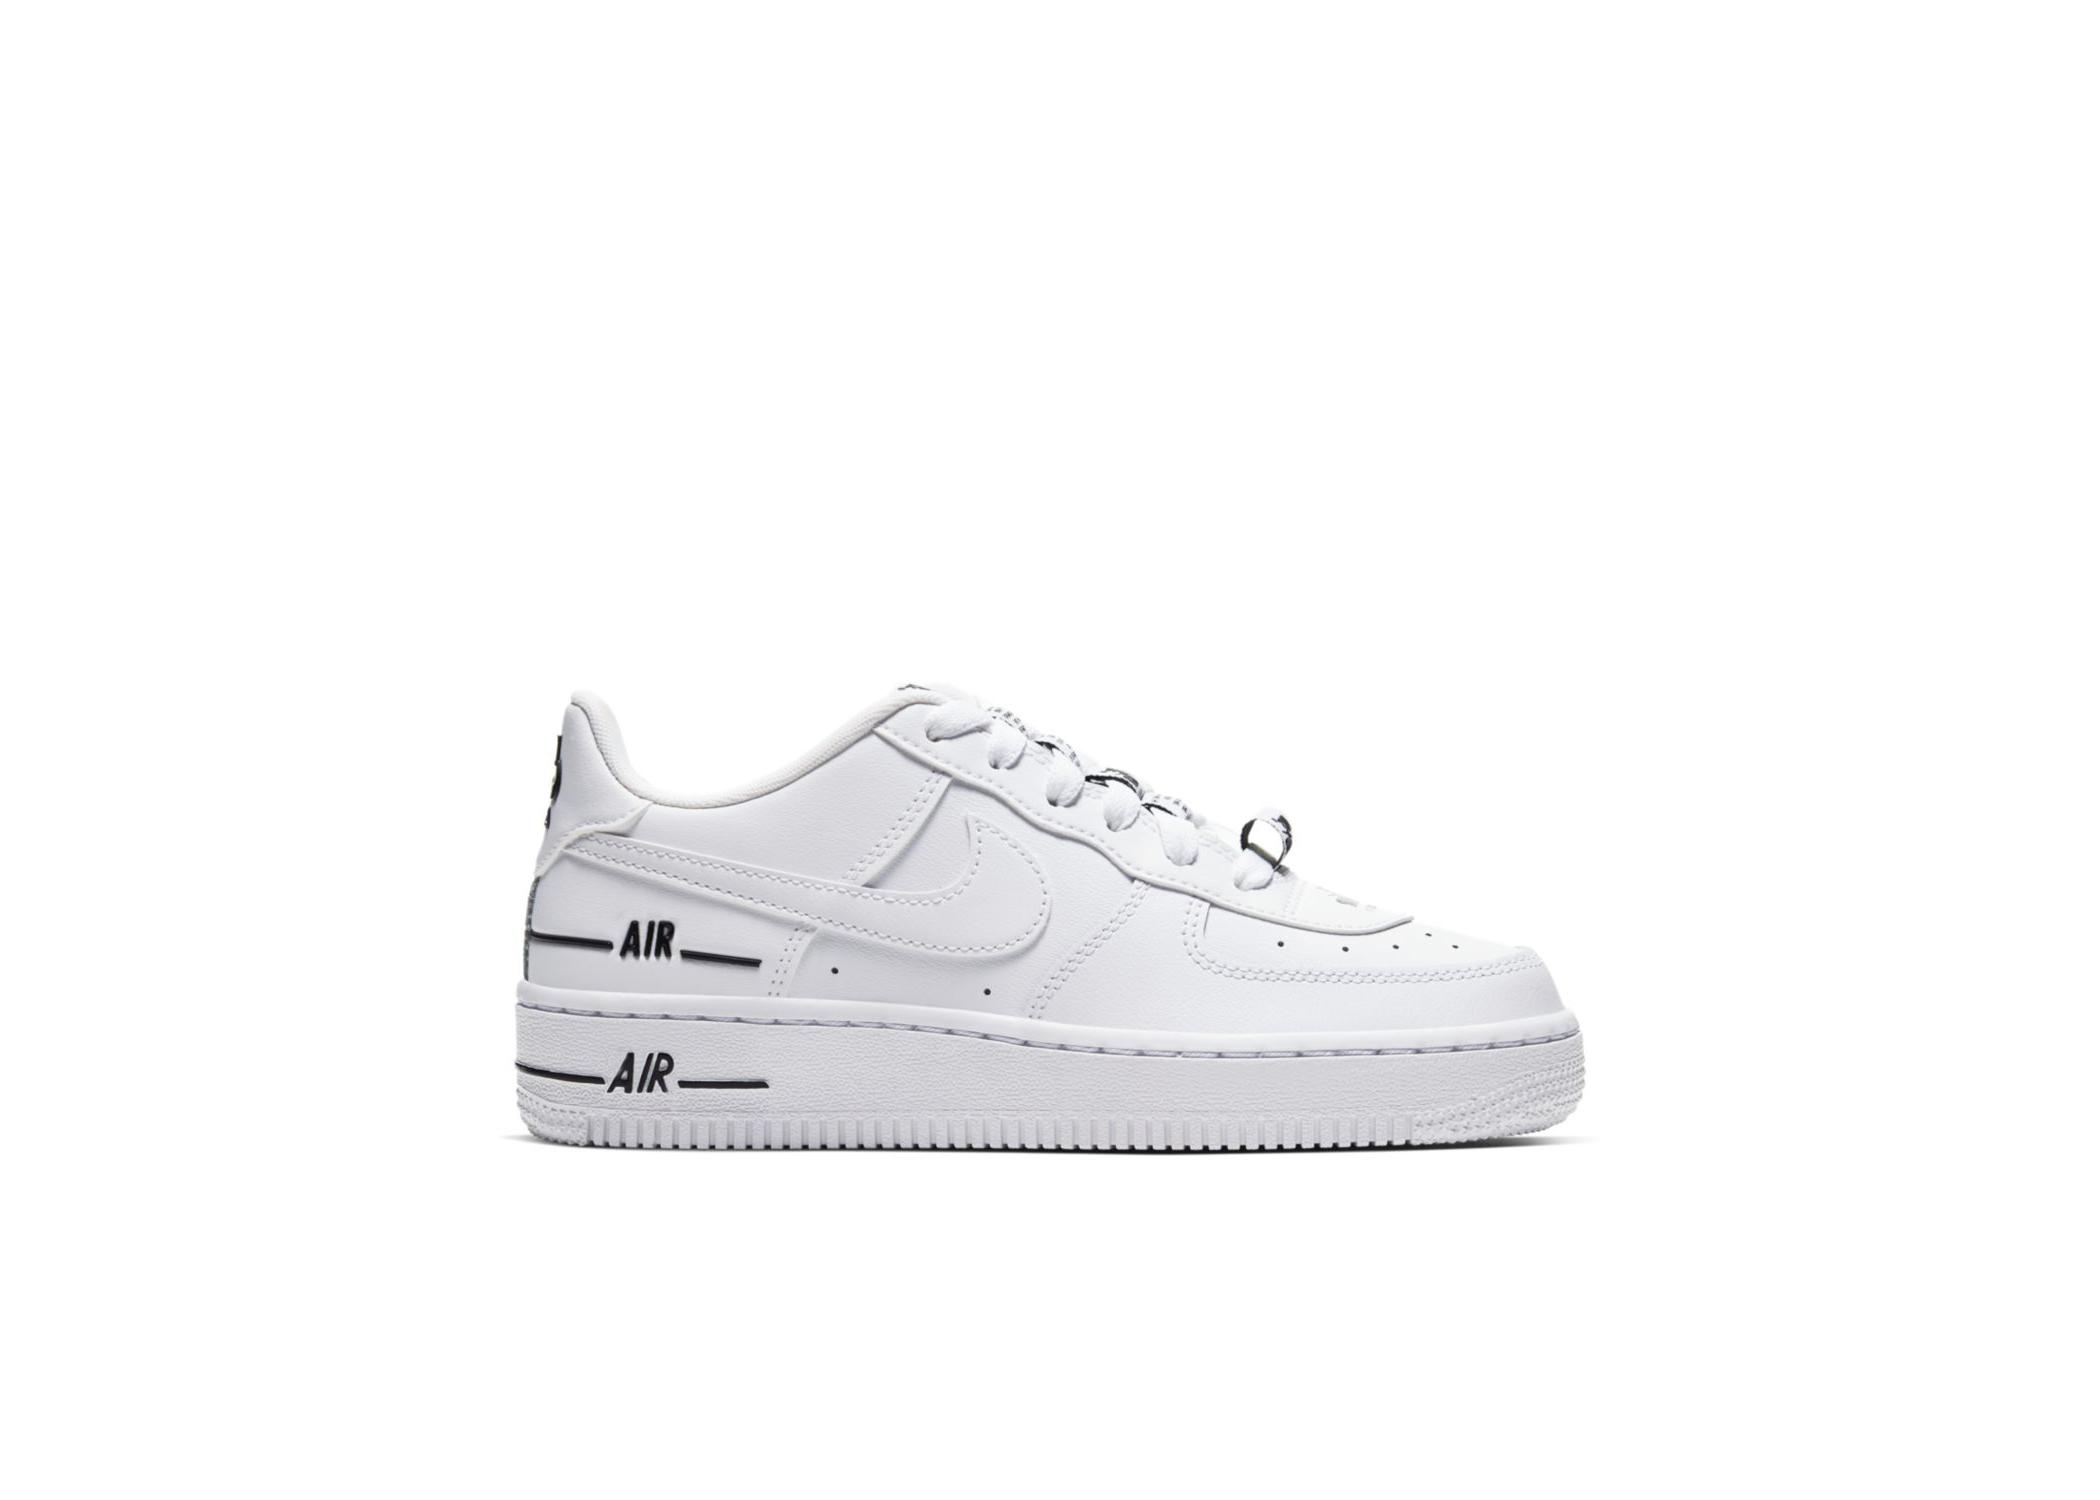 Nike Air Force 1 LV8 3 White Black (GS) - CJ4092-100